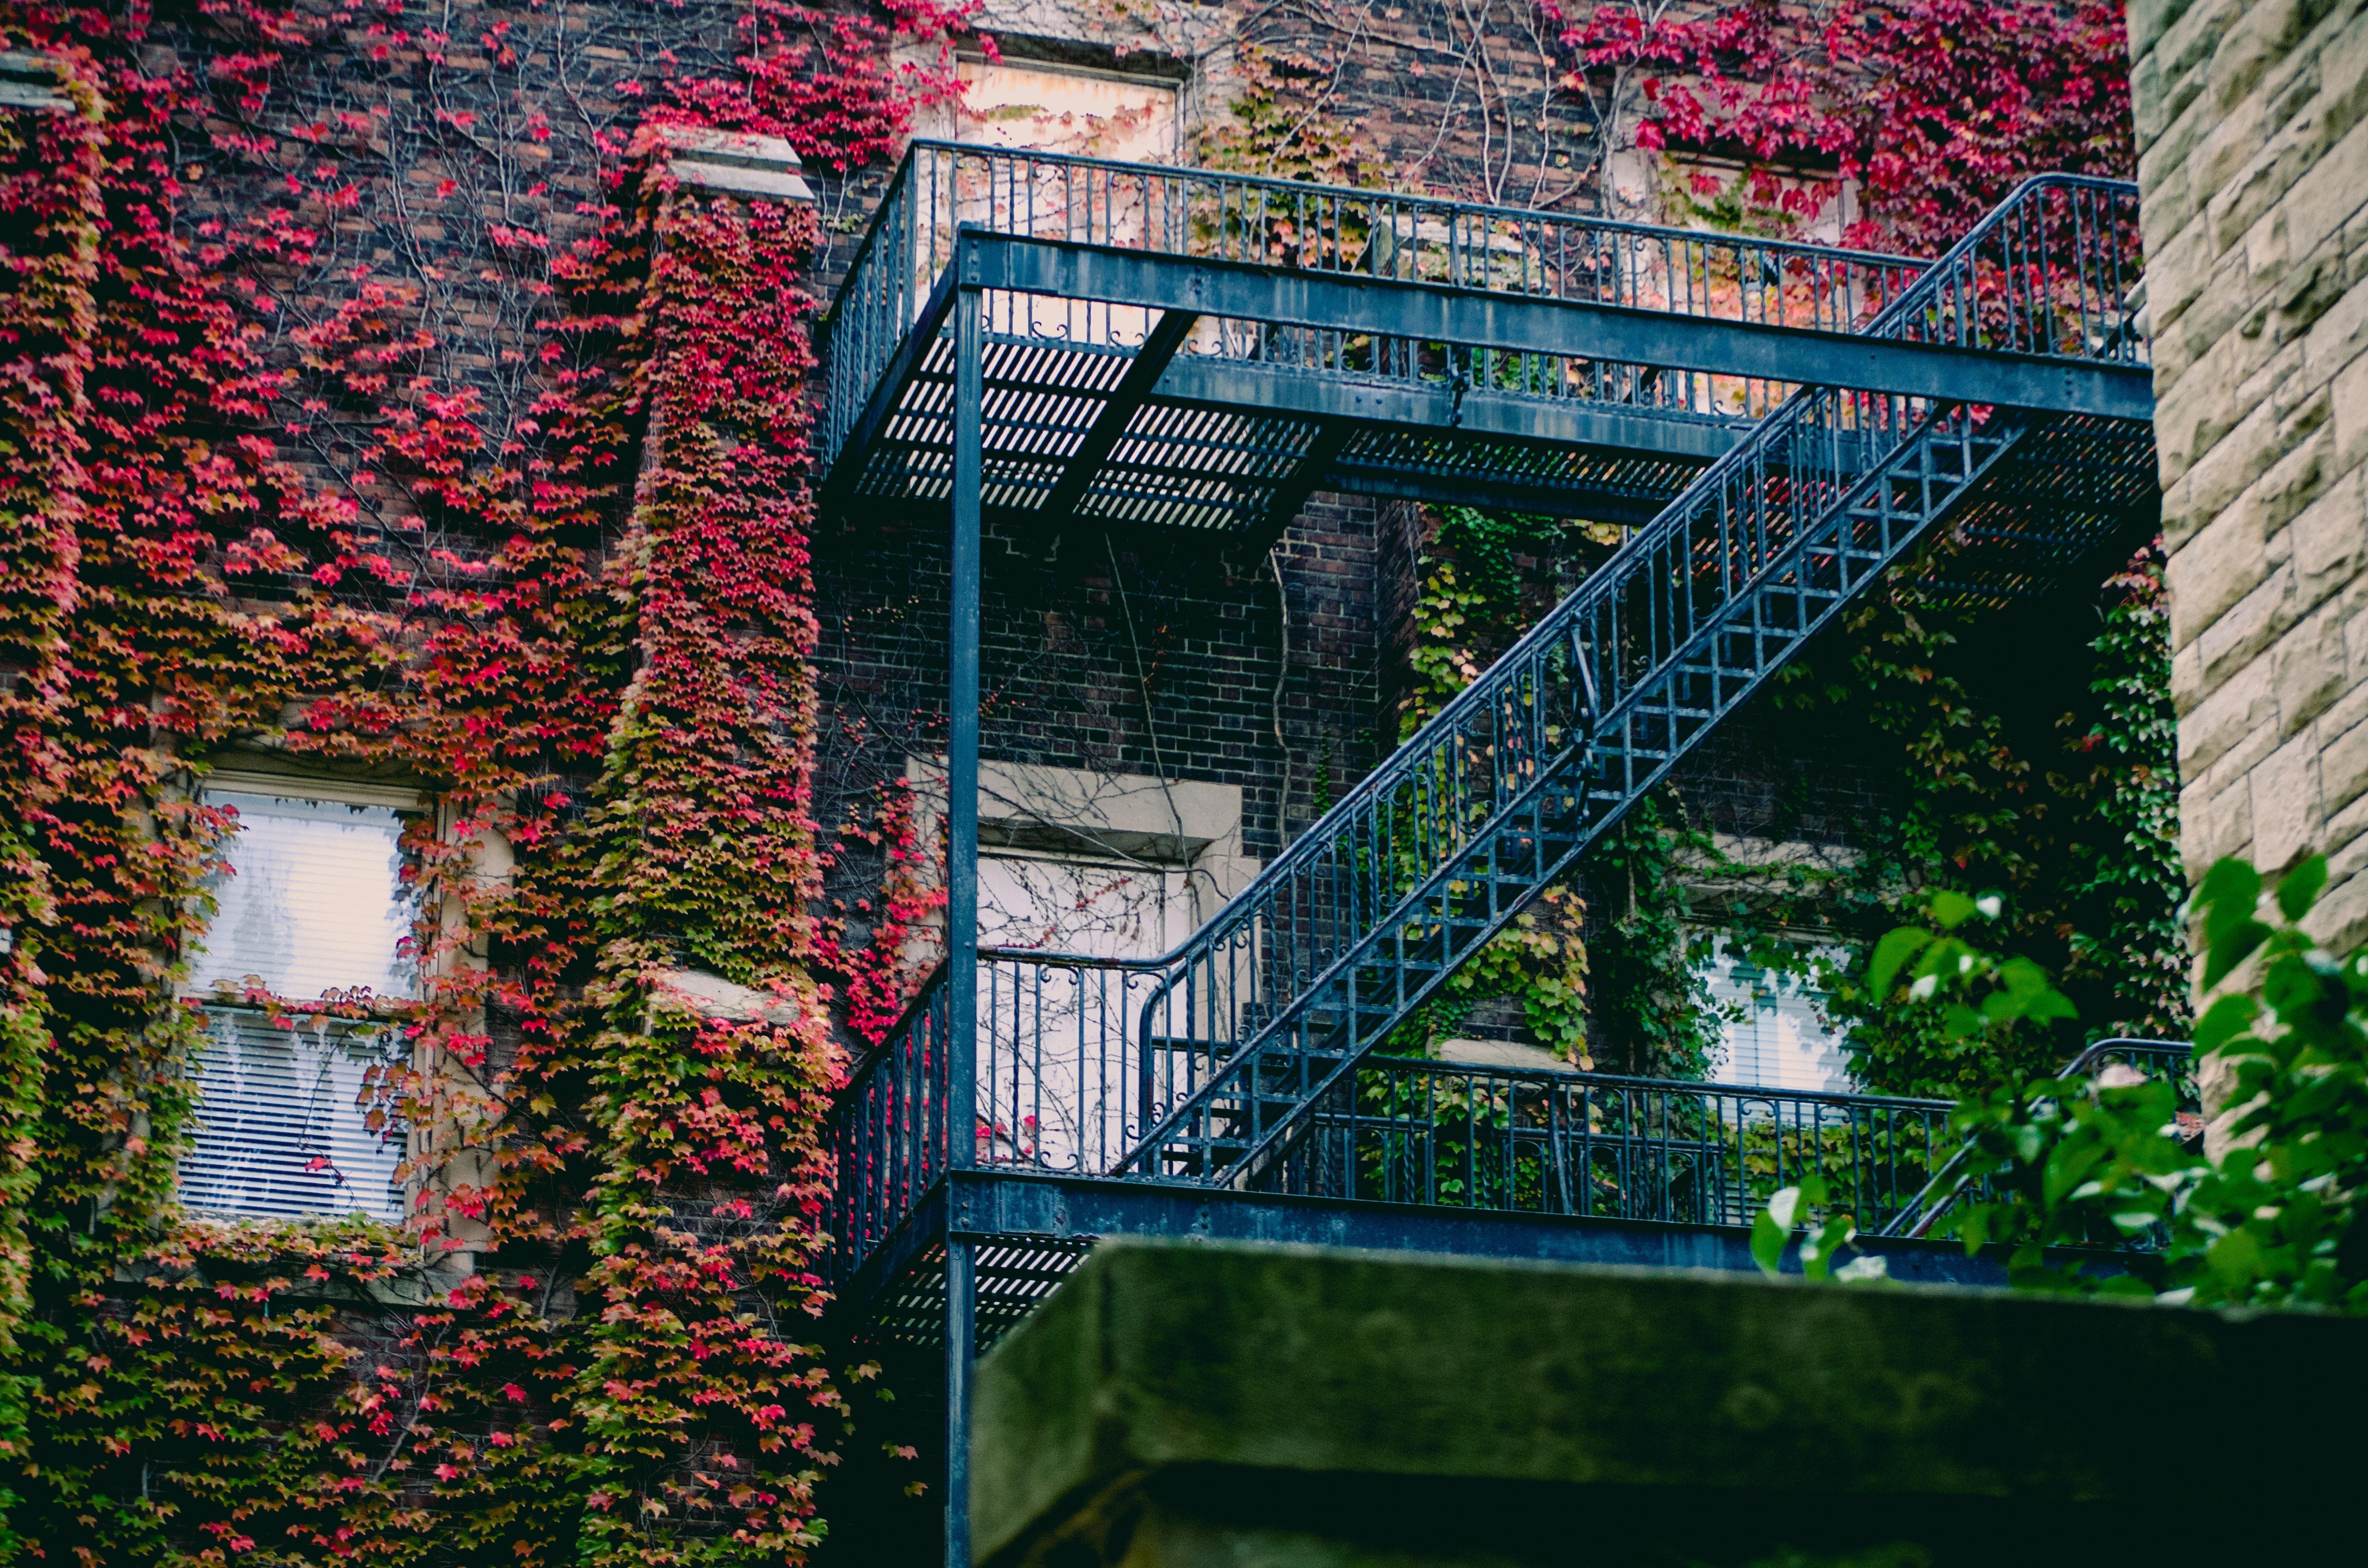 Blue Metal Ladder, Apartment, Overgrown, Ivy, Light, HQ Photo